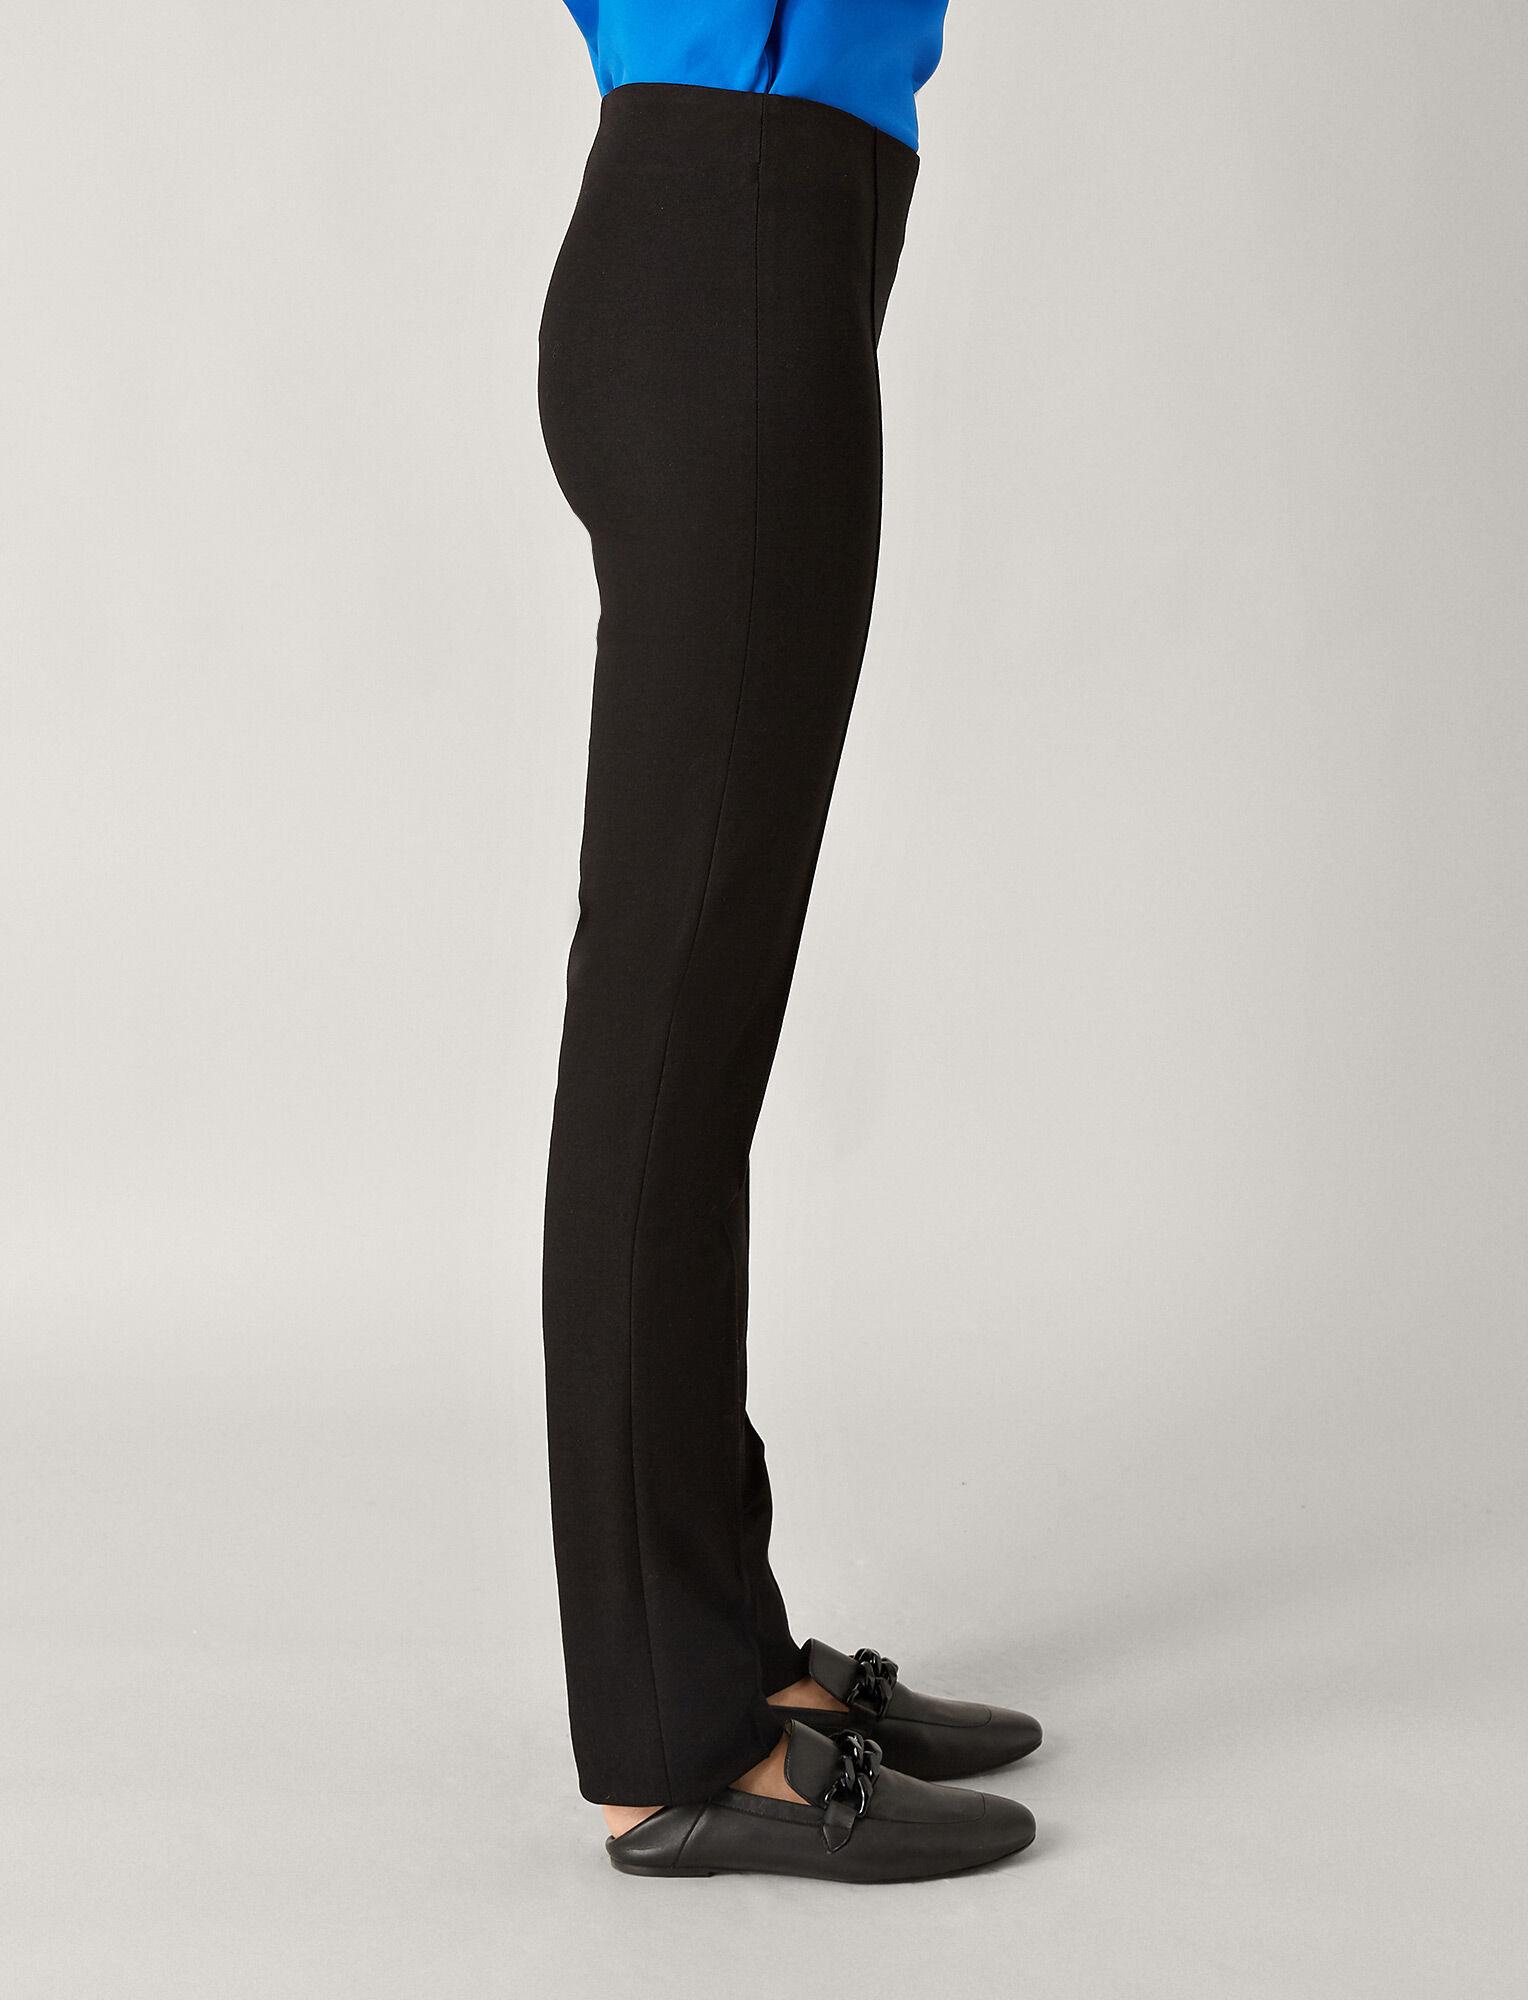 Joseph, Floyd Gabardine Stretch Trousers, in BLACK